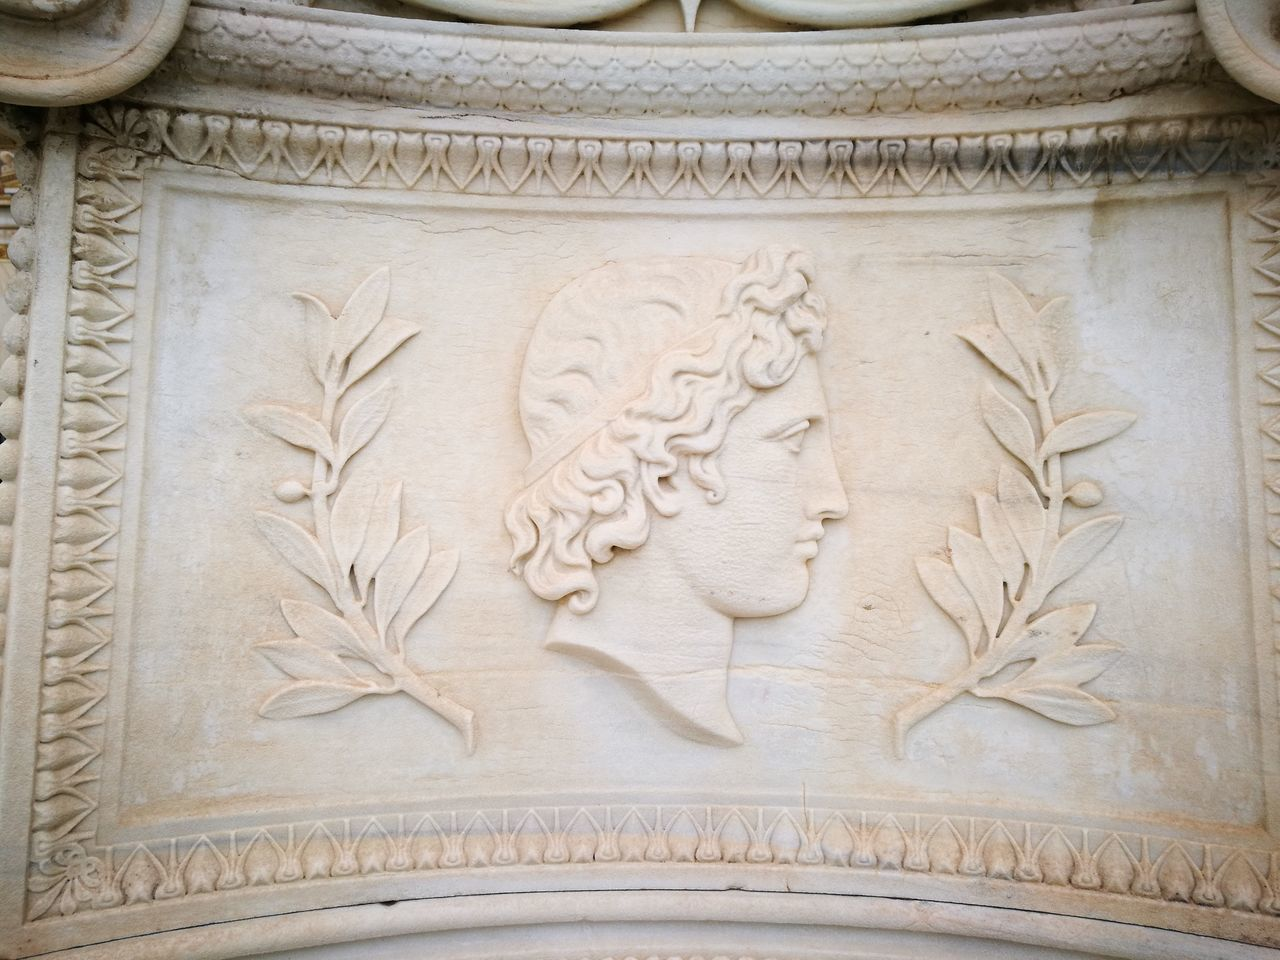 Greece Greece Athens Athens Academy Relief Sculpture Ancient Greece Gods